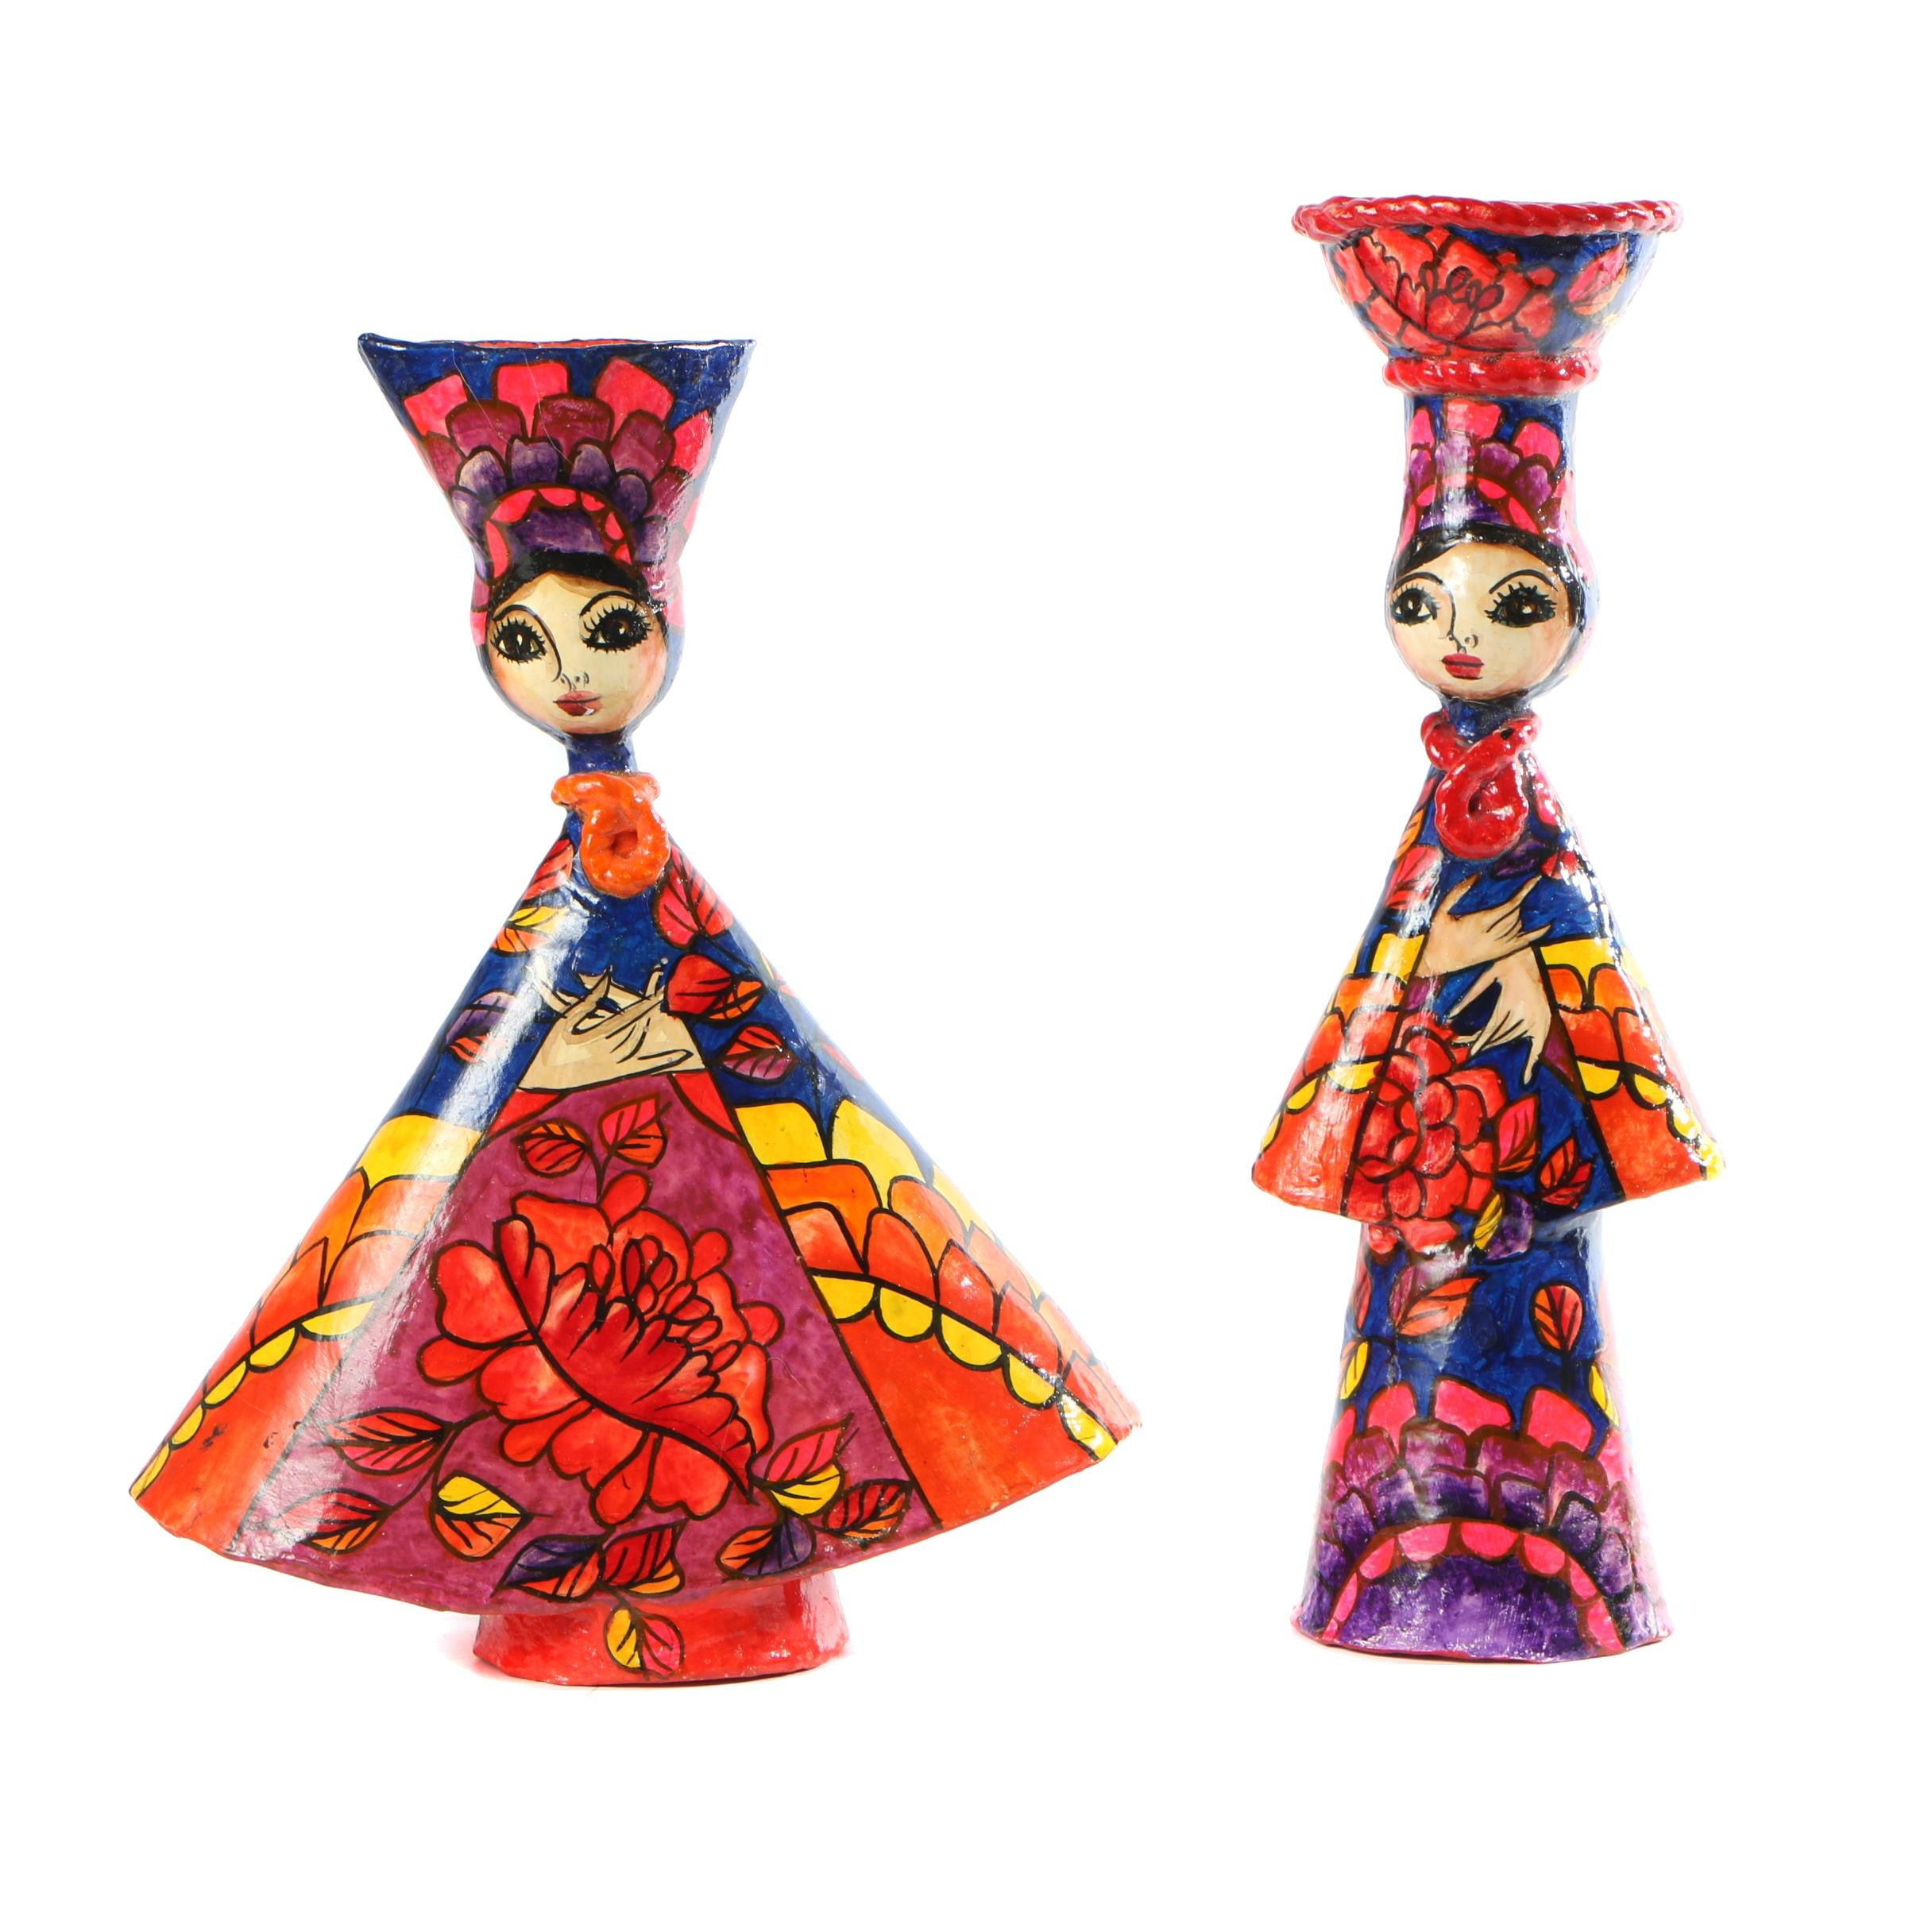 Abelardo Ruiz Mexican Papier-mâché Dolls